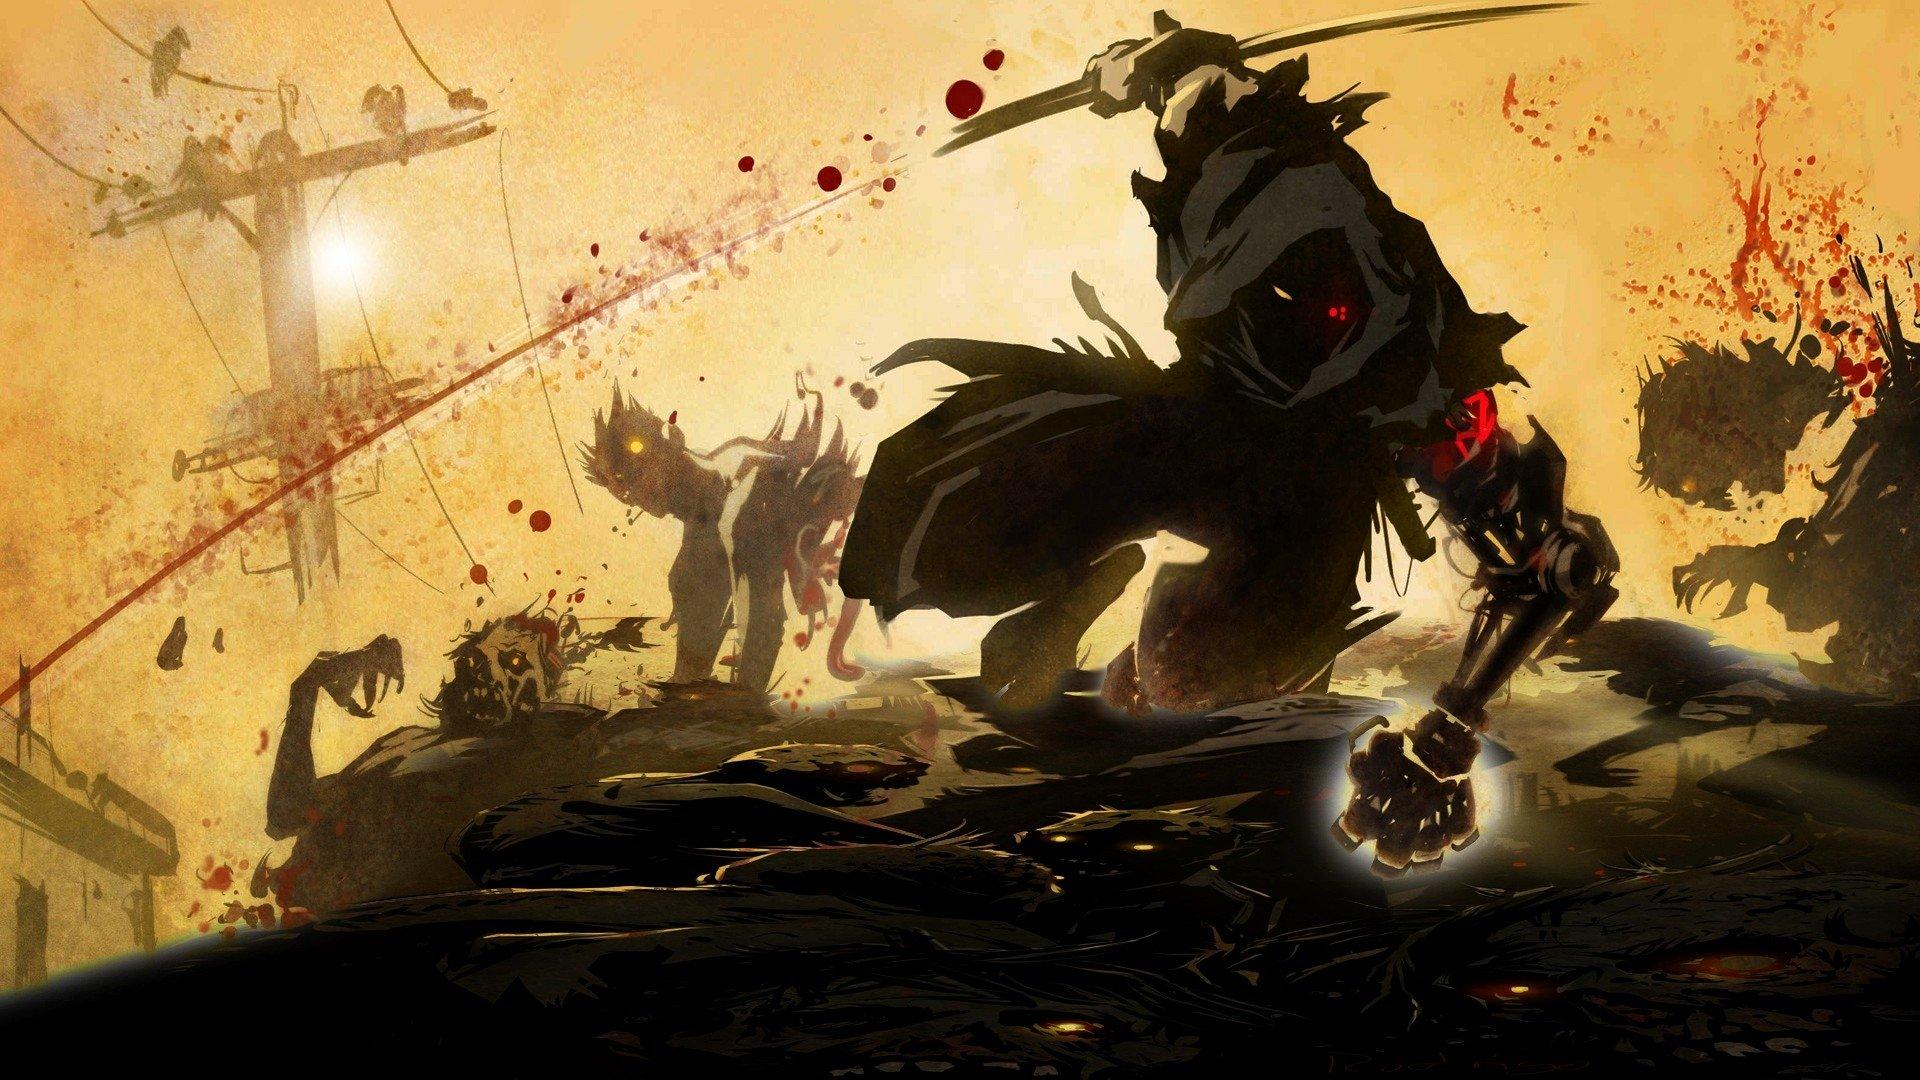 24 Ninja Gaiden HD Wallpapers Backgrounds Wallpaper Abyss